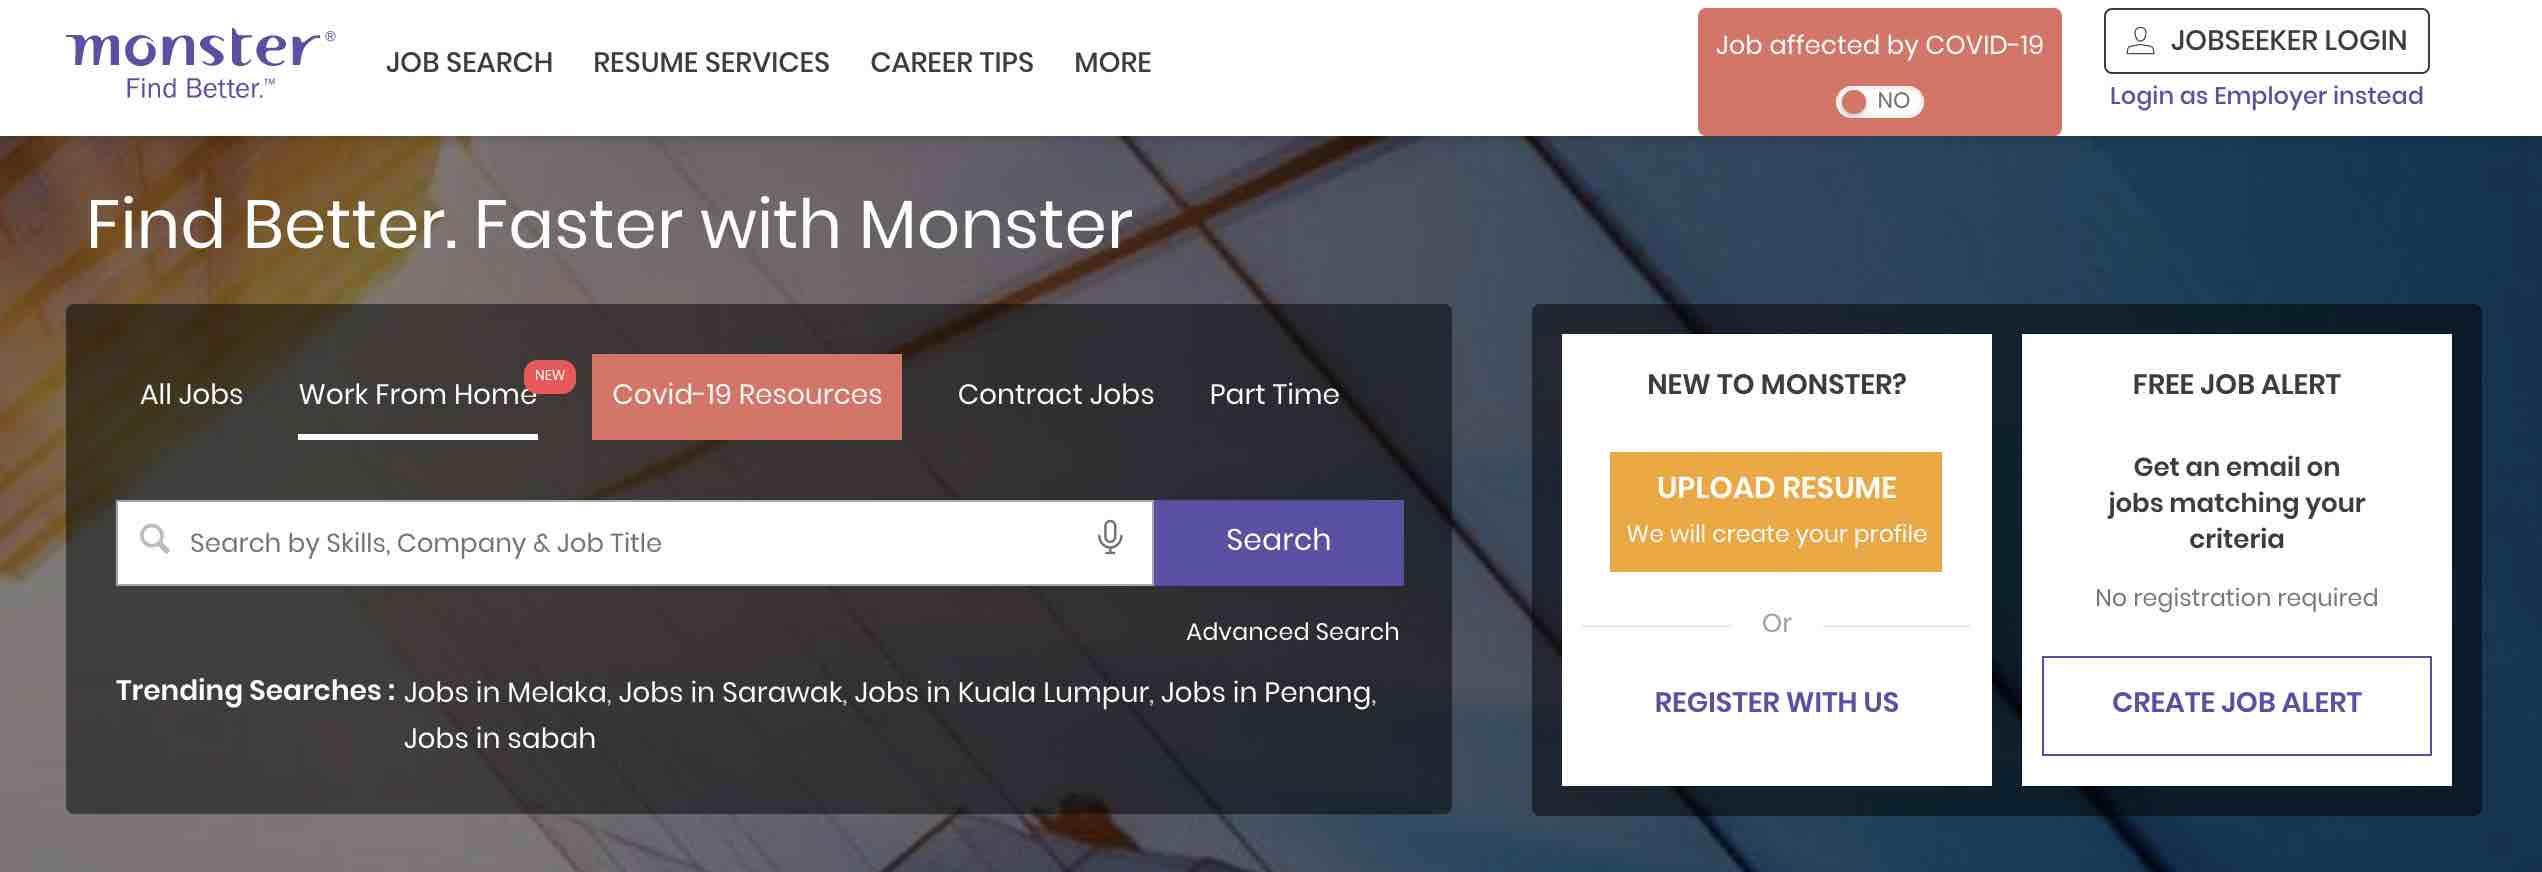 Monster Singapore